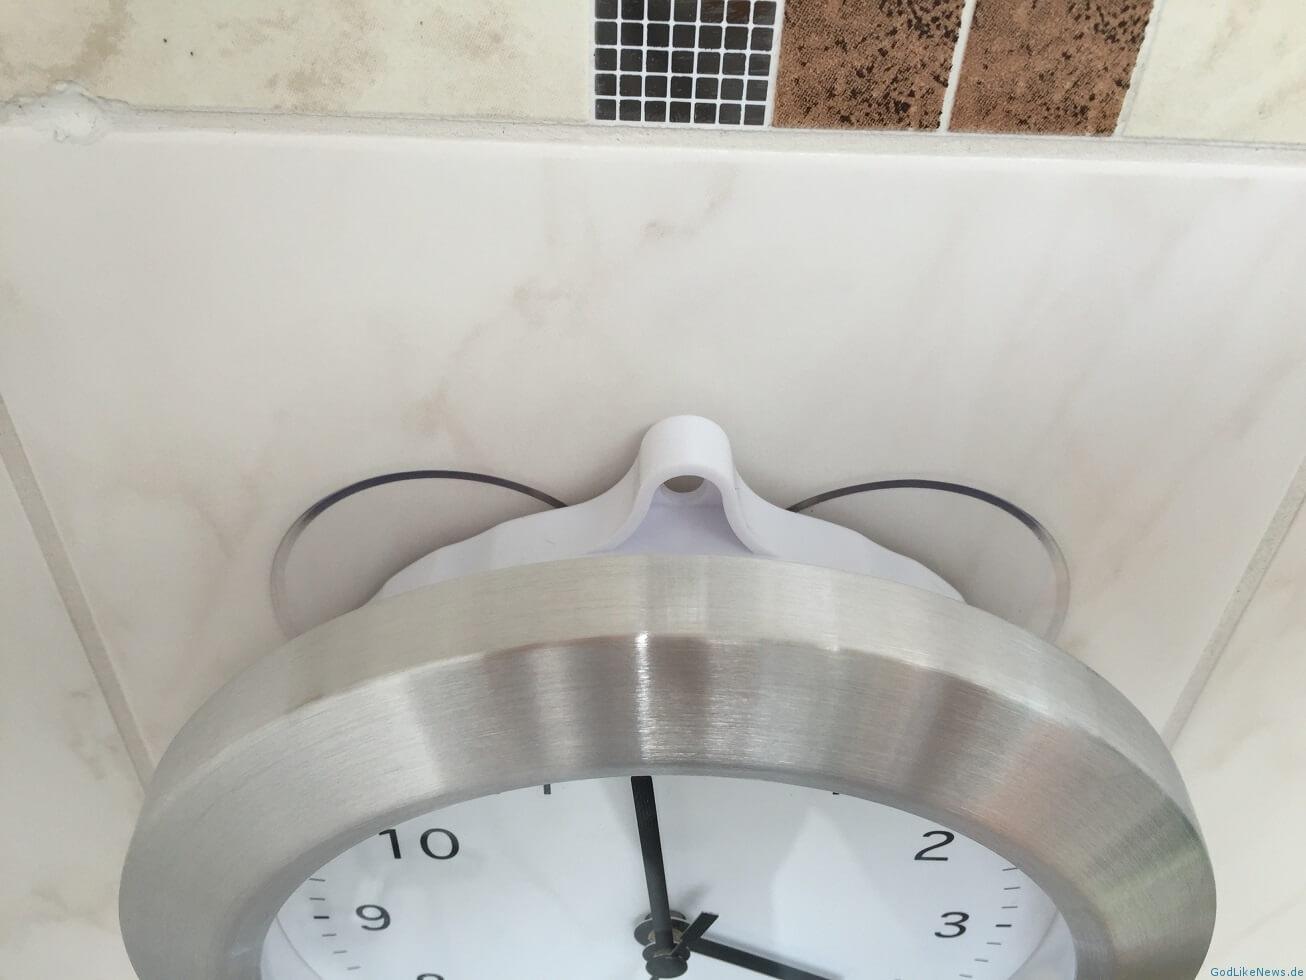 Badezimmeruhr Mit Saugnapf Thermometer Review Godlikenews De